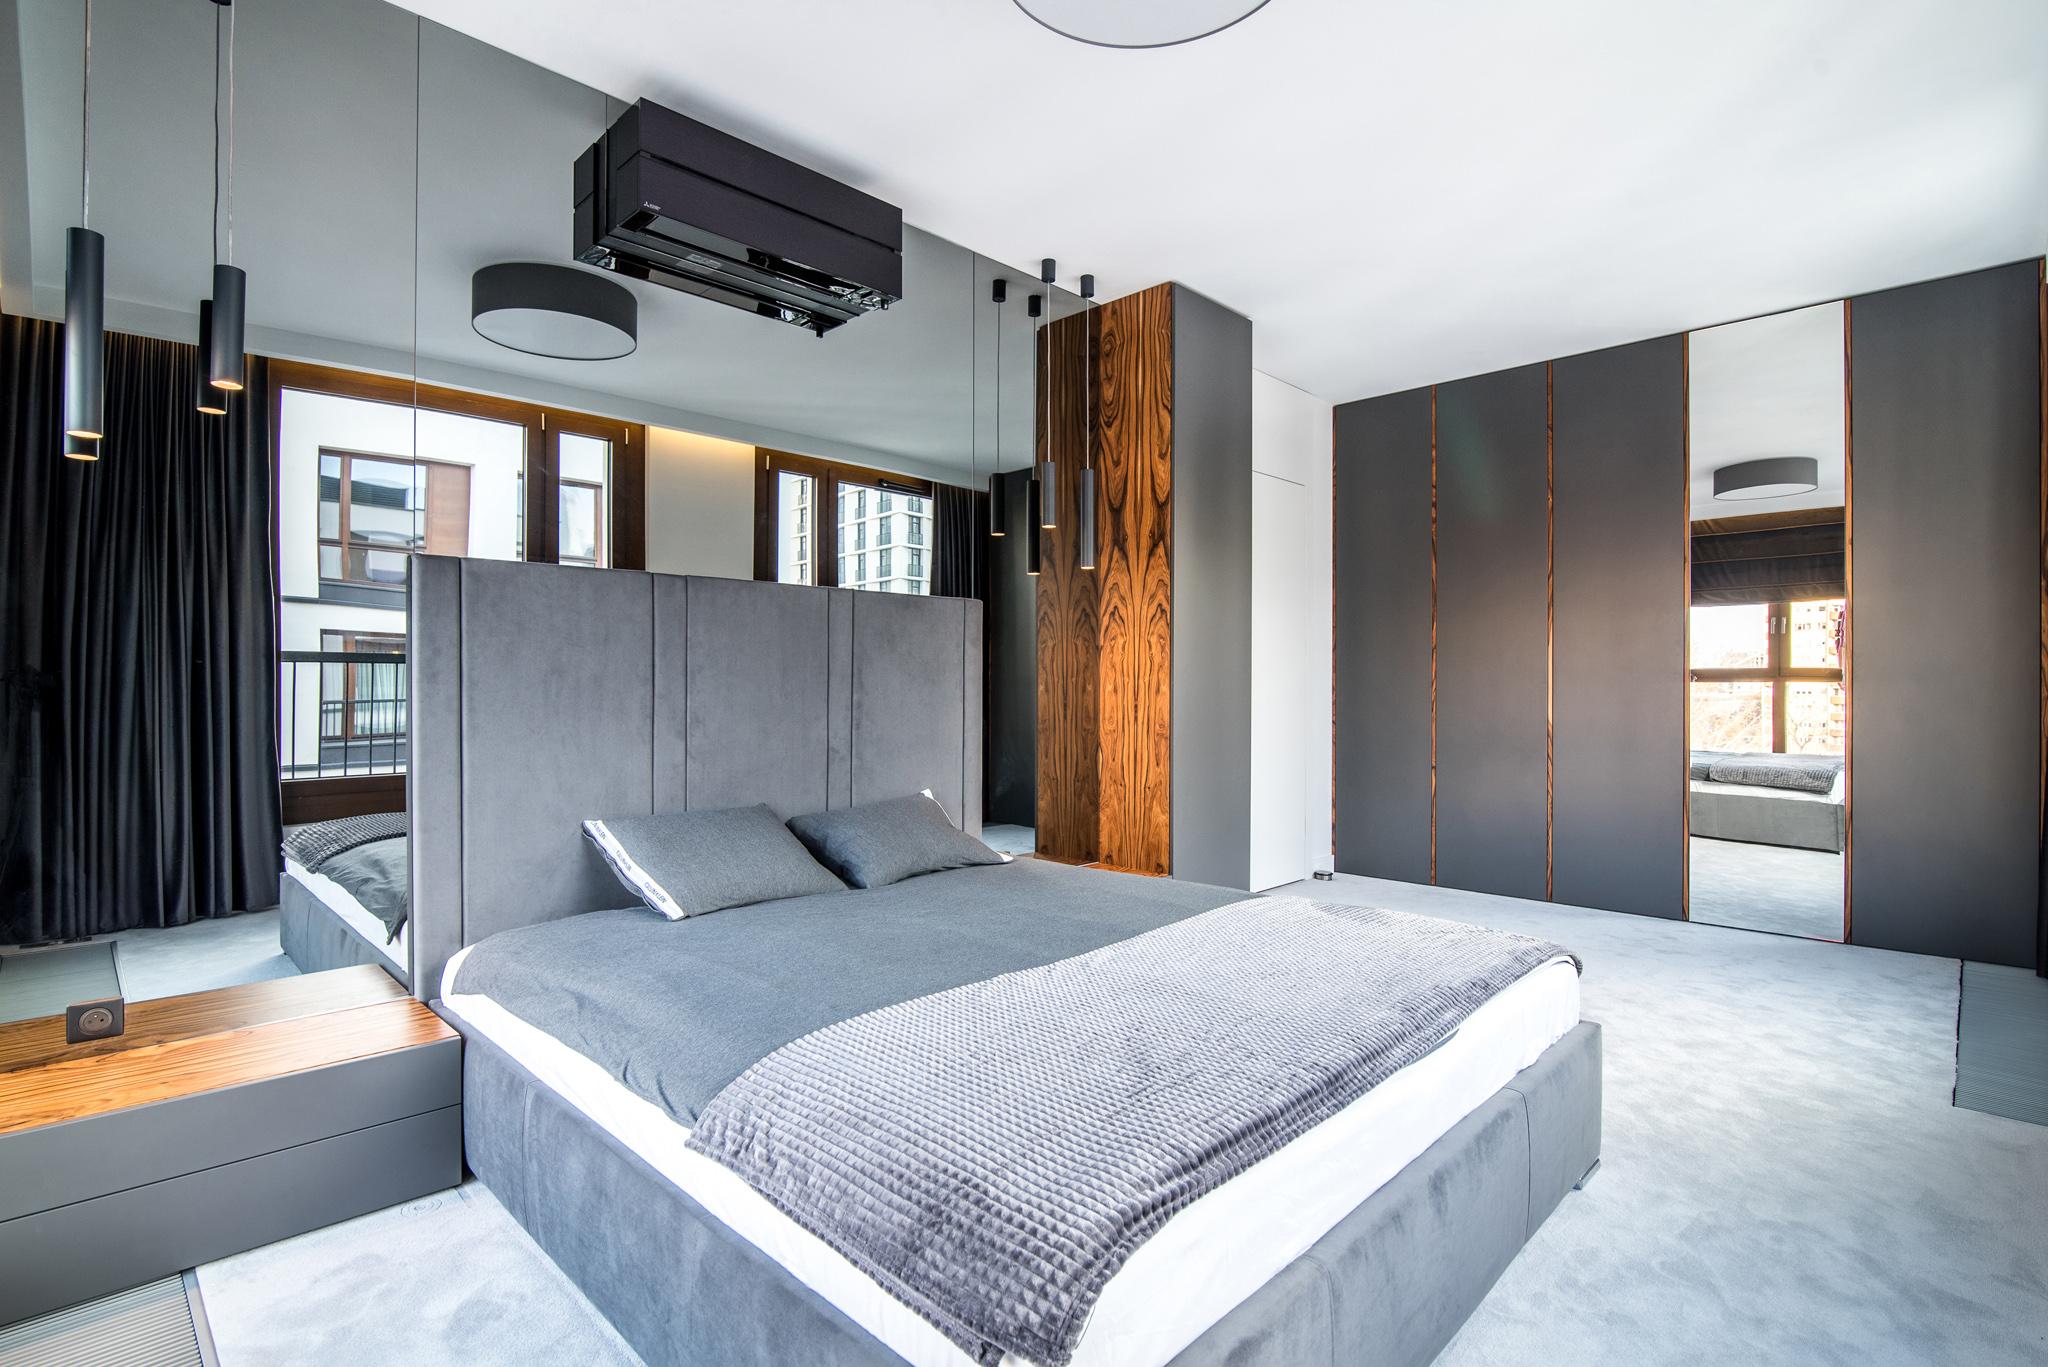 Luksusowy apartament kompleksowo